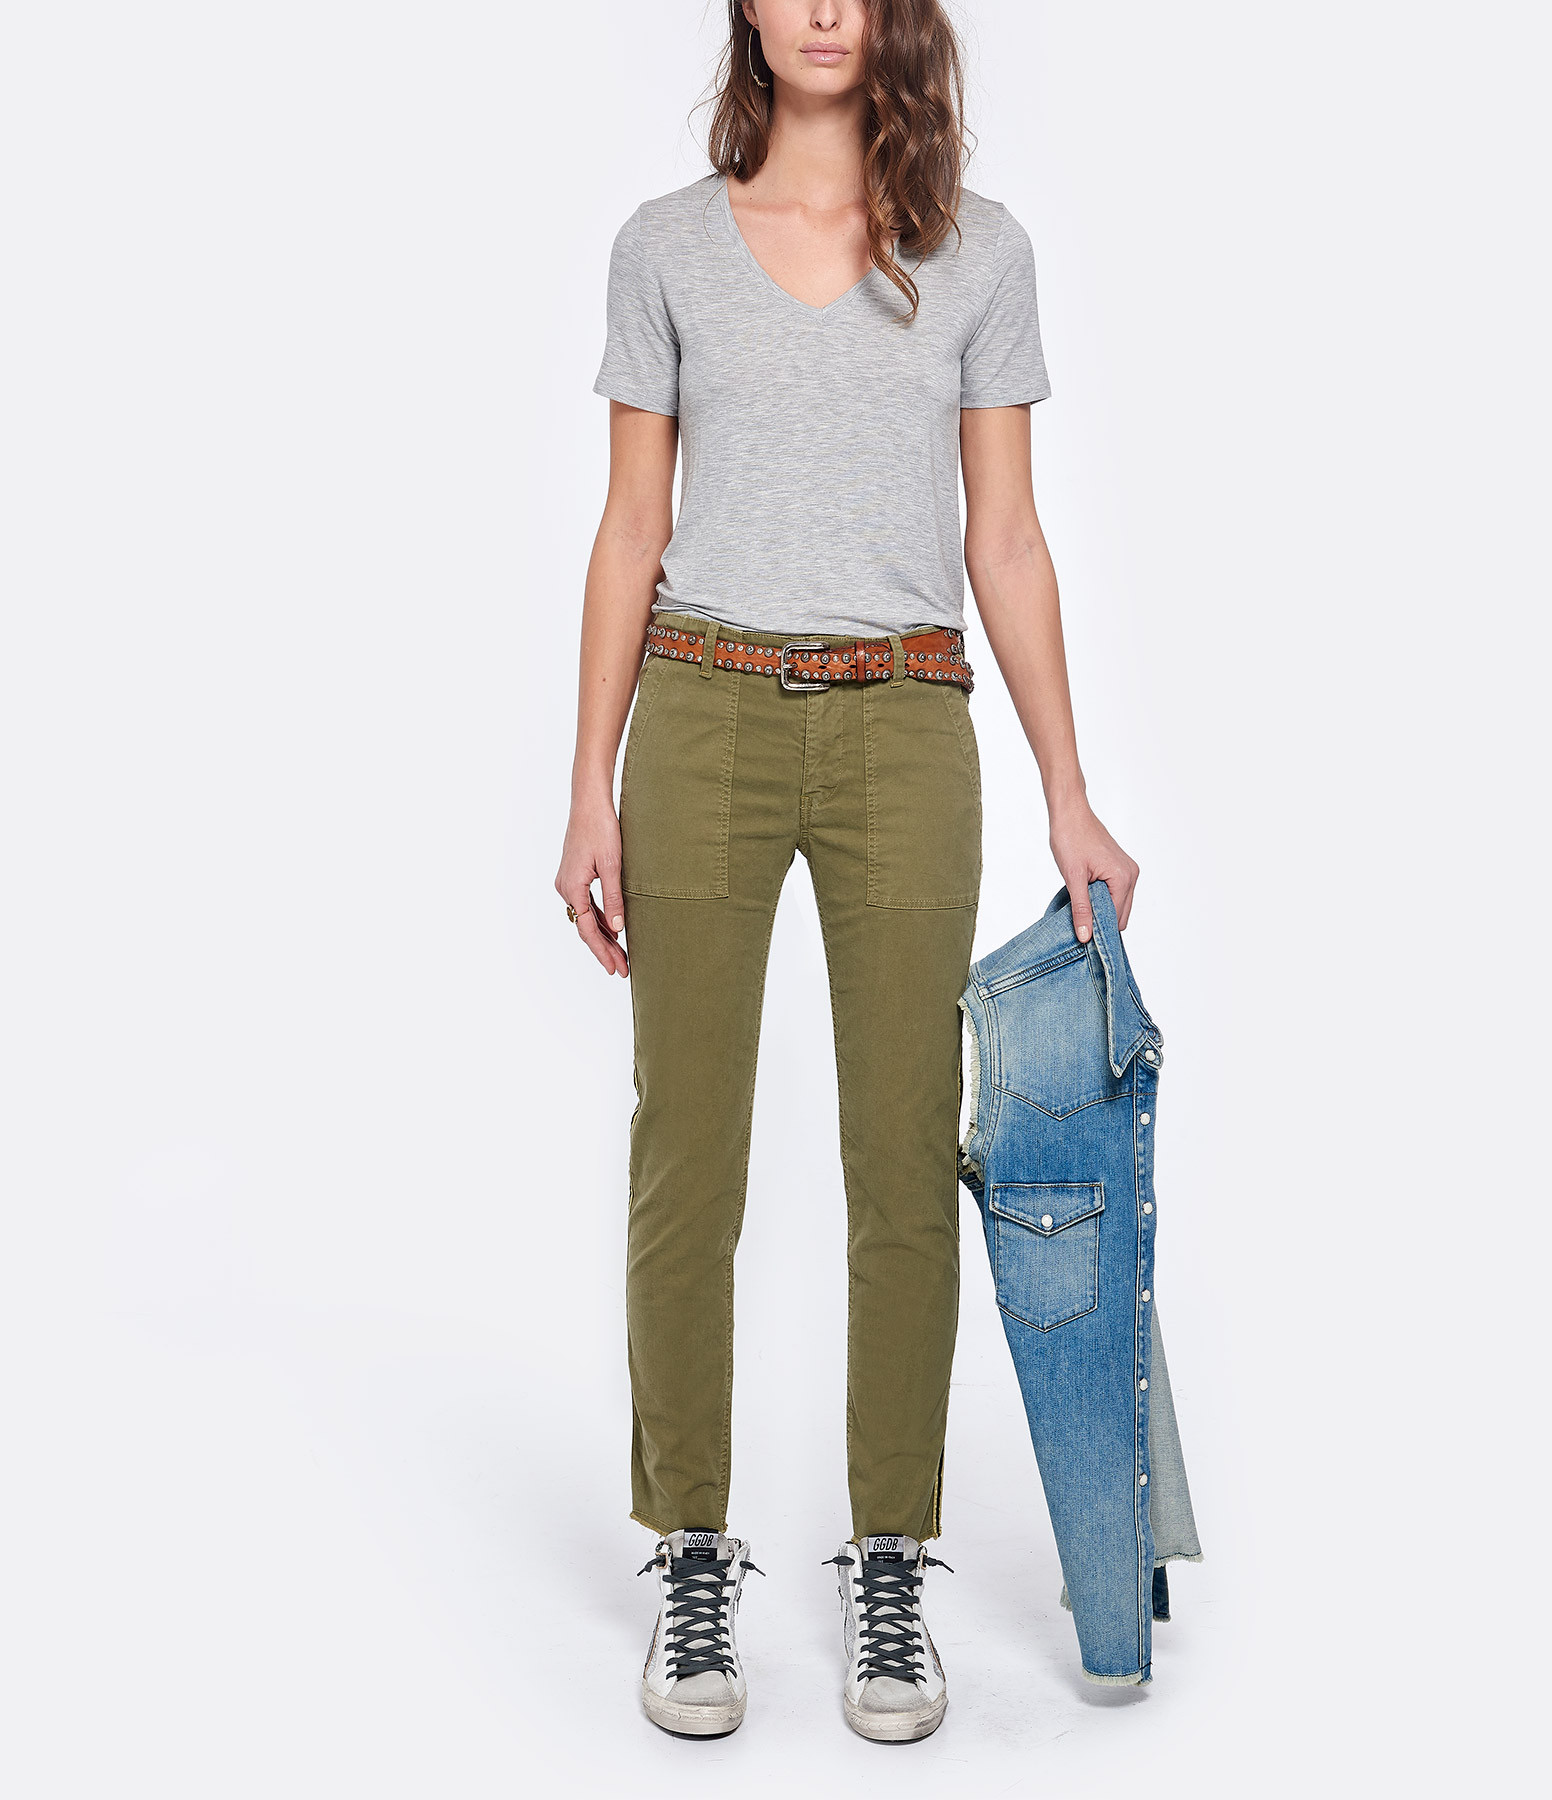 NILI LOTAN - Pantalon Jenna Sage Marron